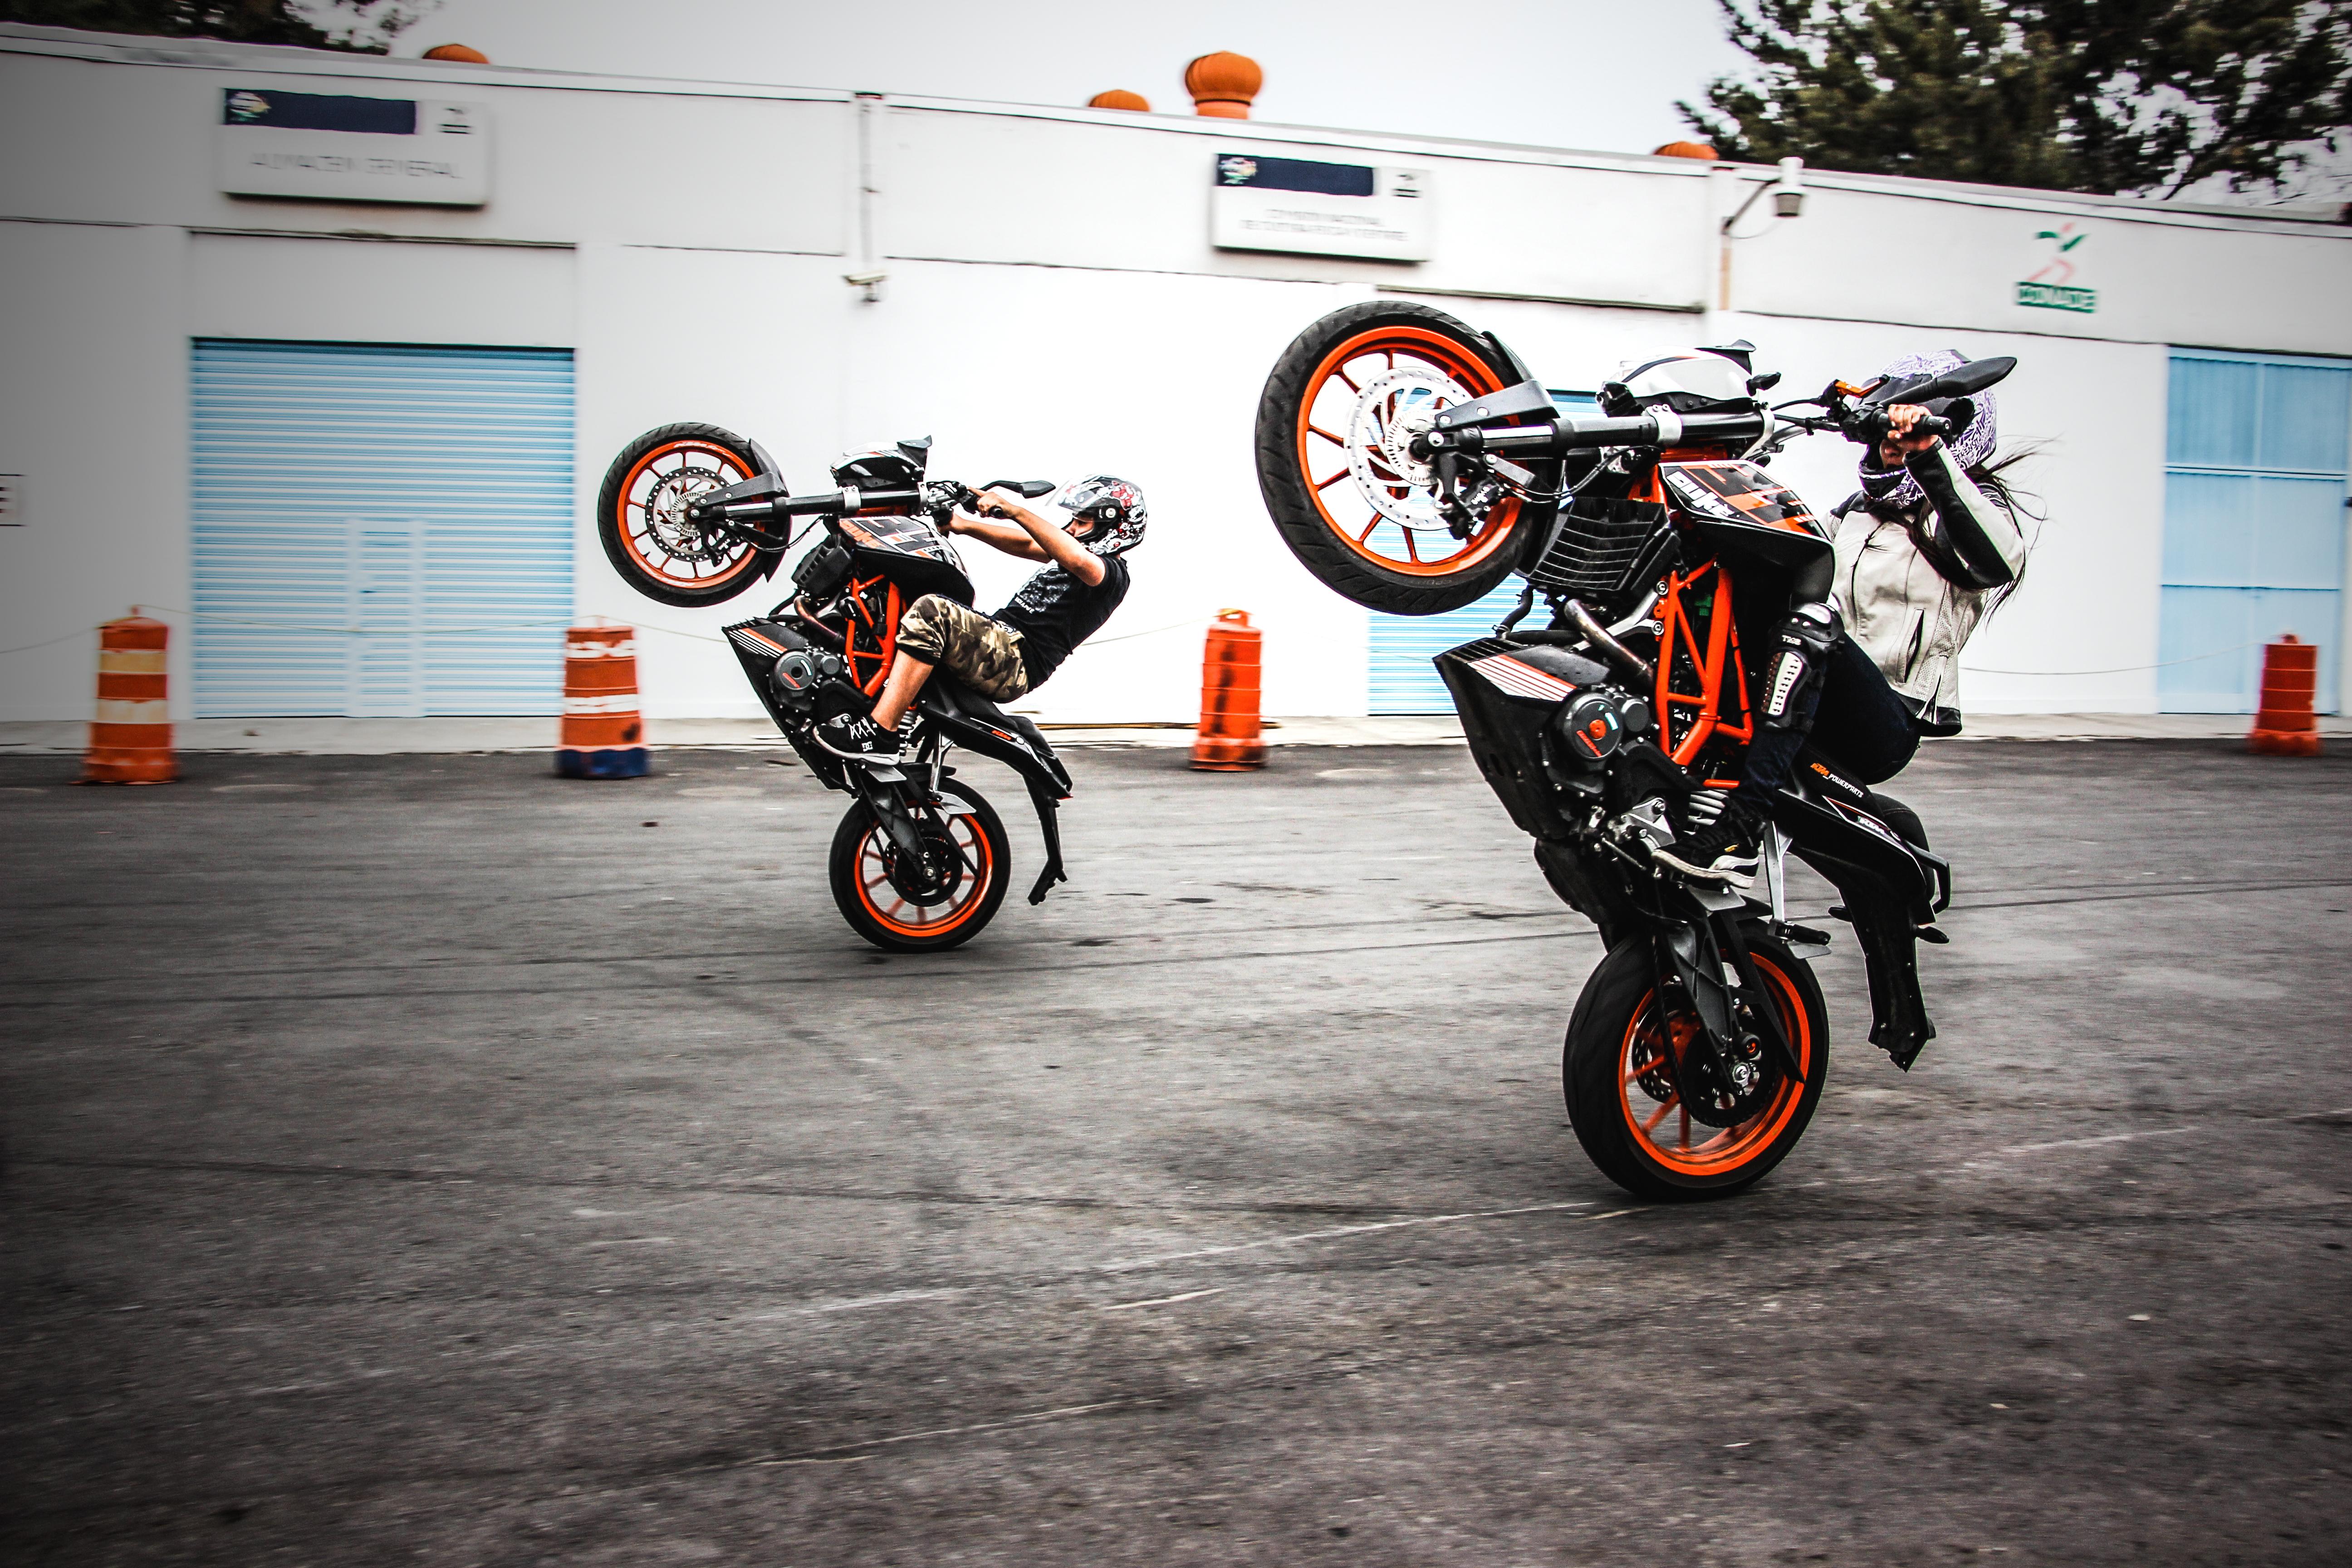 Two Men Riding Orange-and-black Sports Bikes While Doing Exhibition